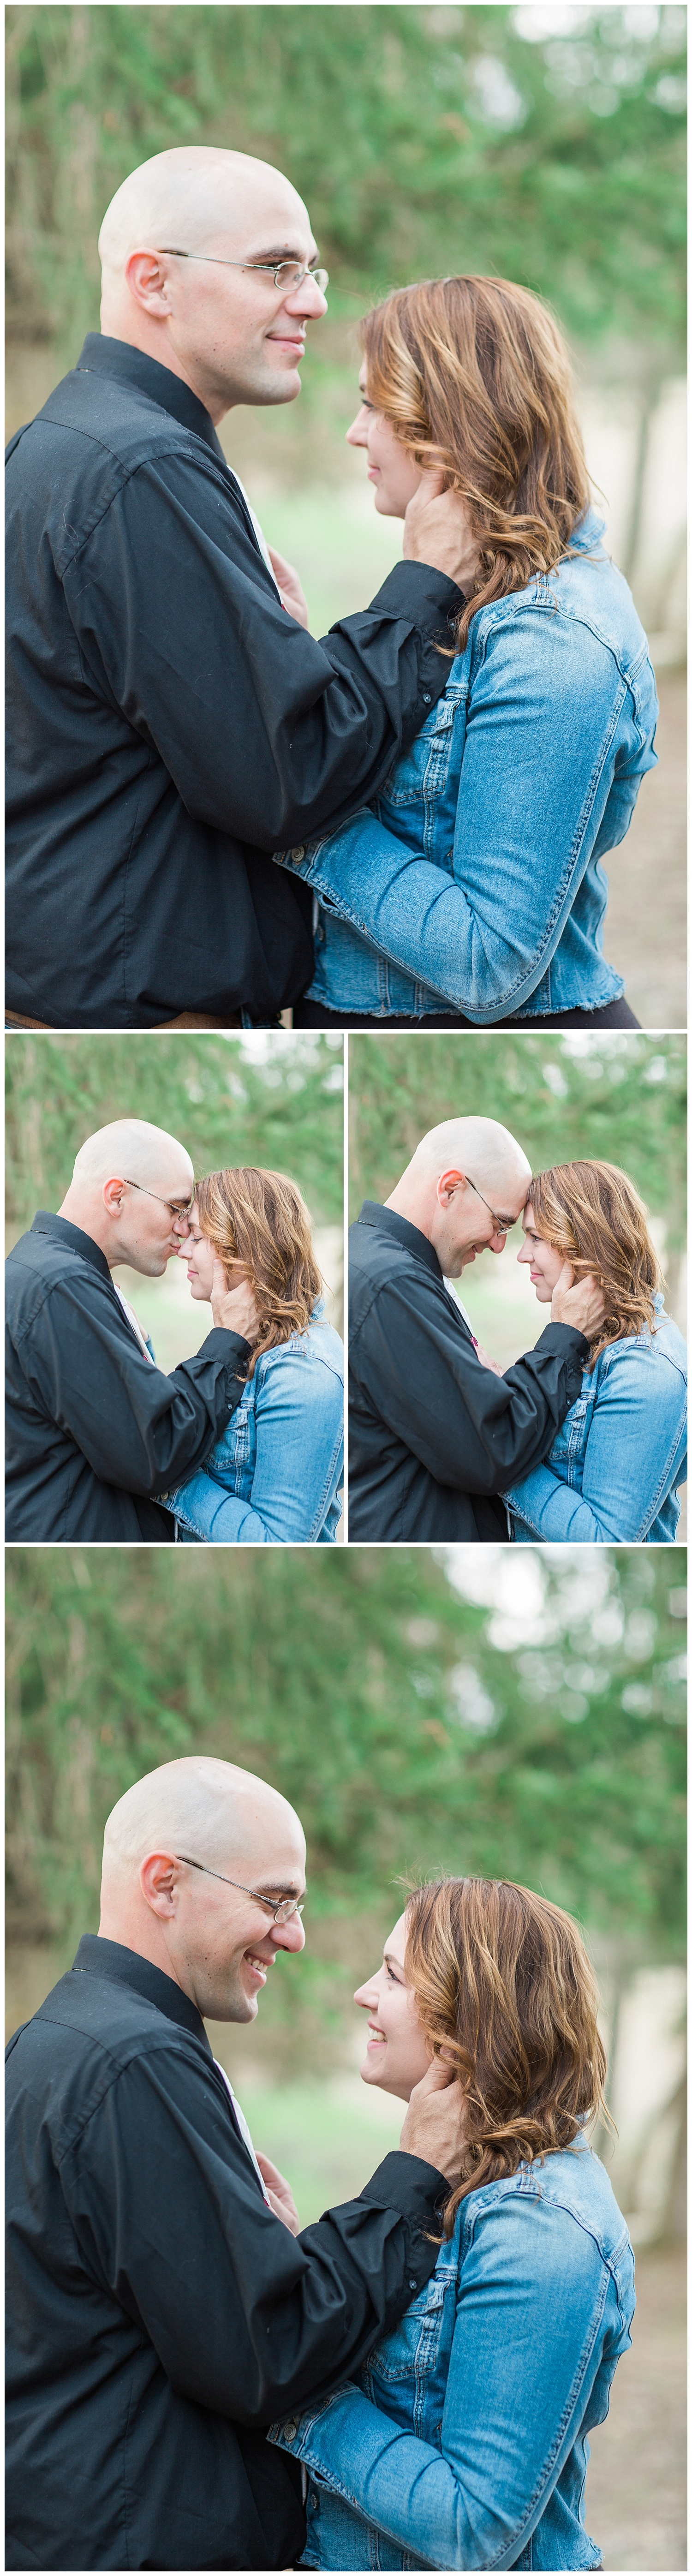 Melissa and Sam - engagement session Lass and Beau -64_Buffalo wedding photography.jpg